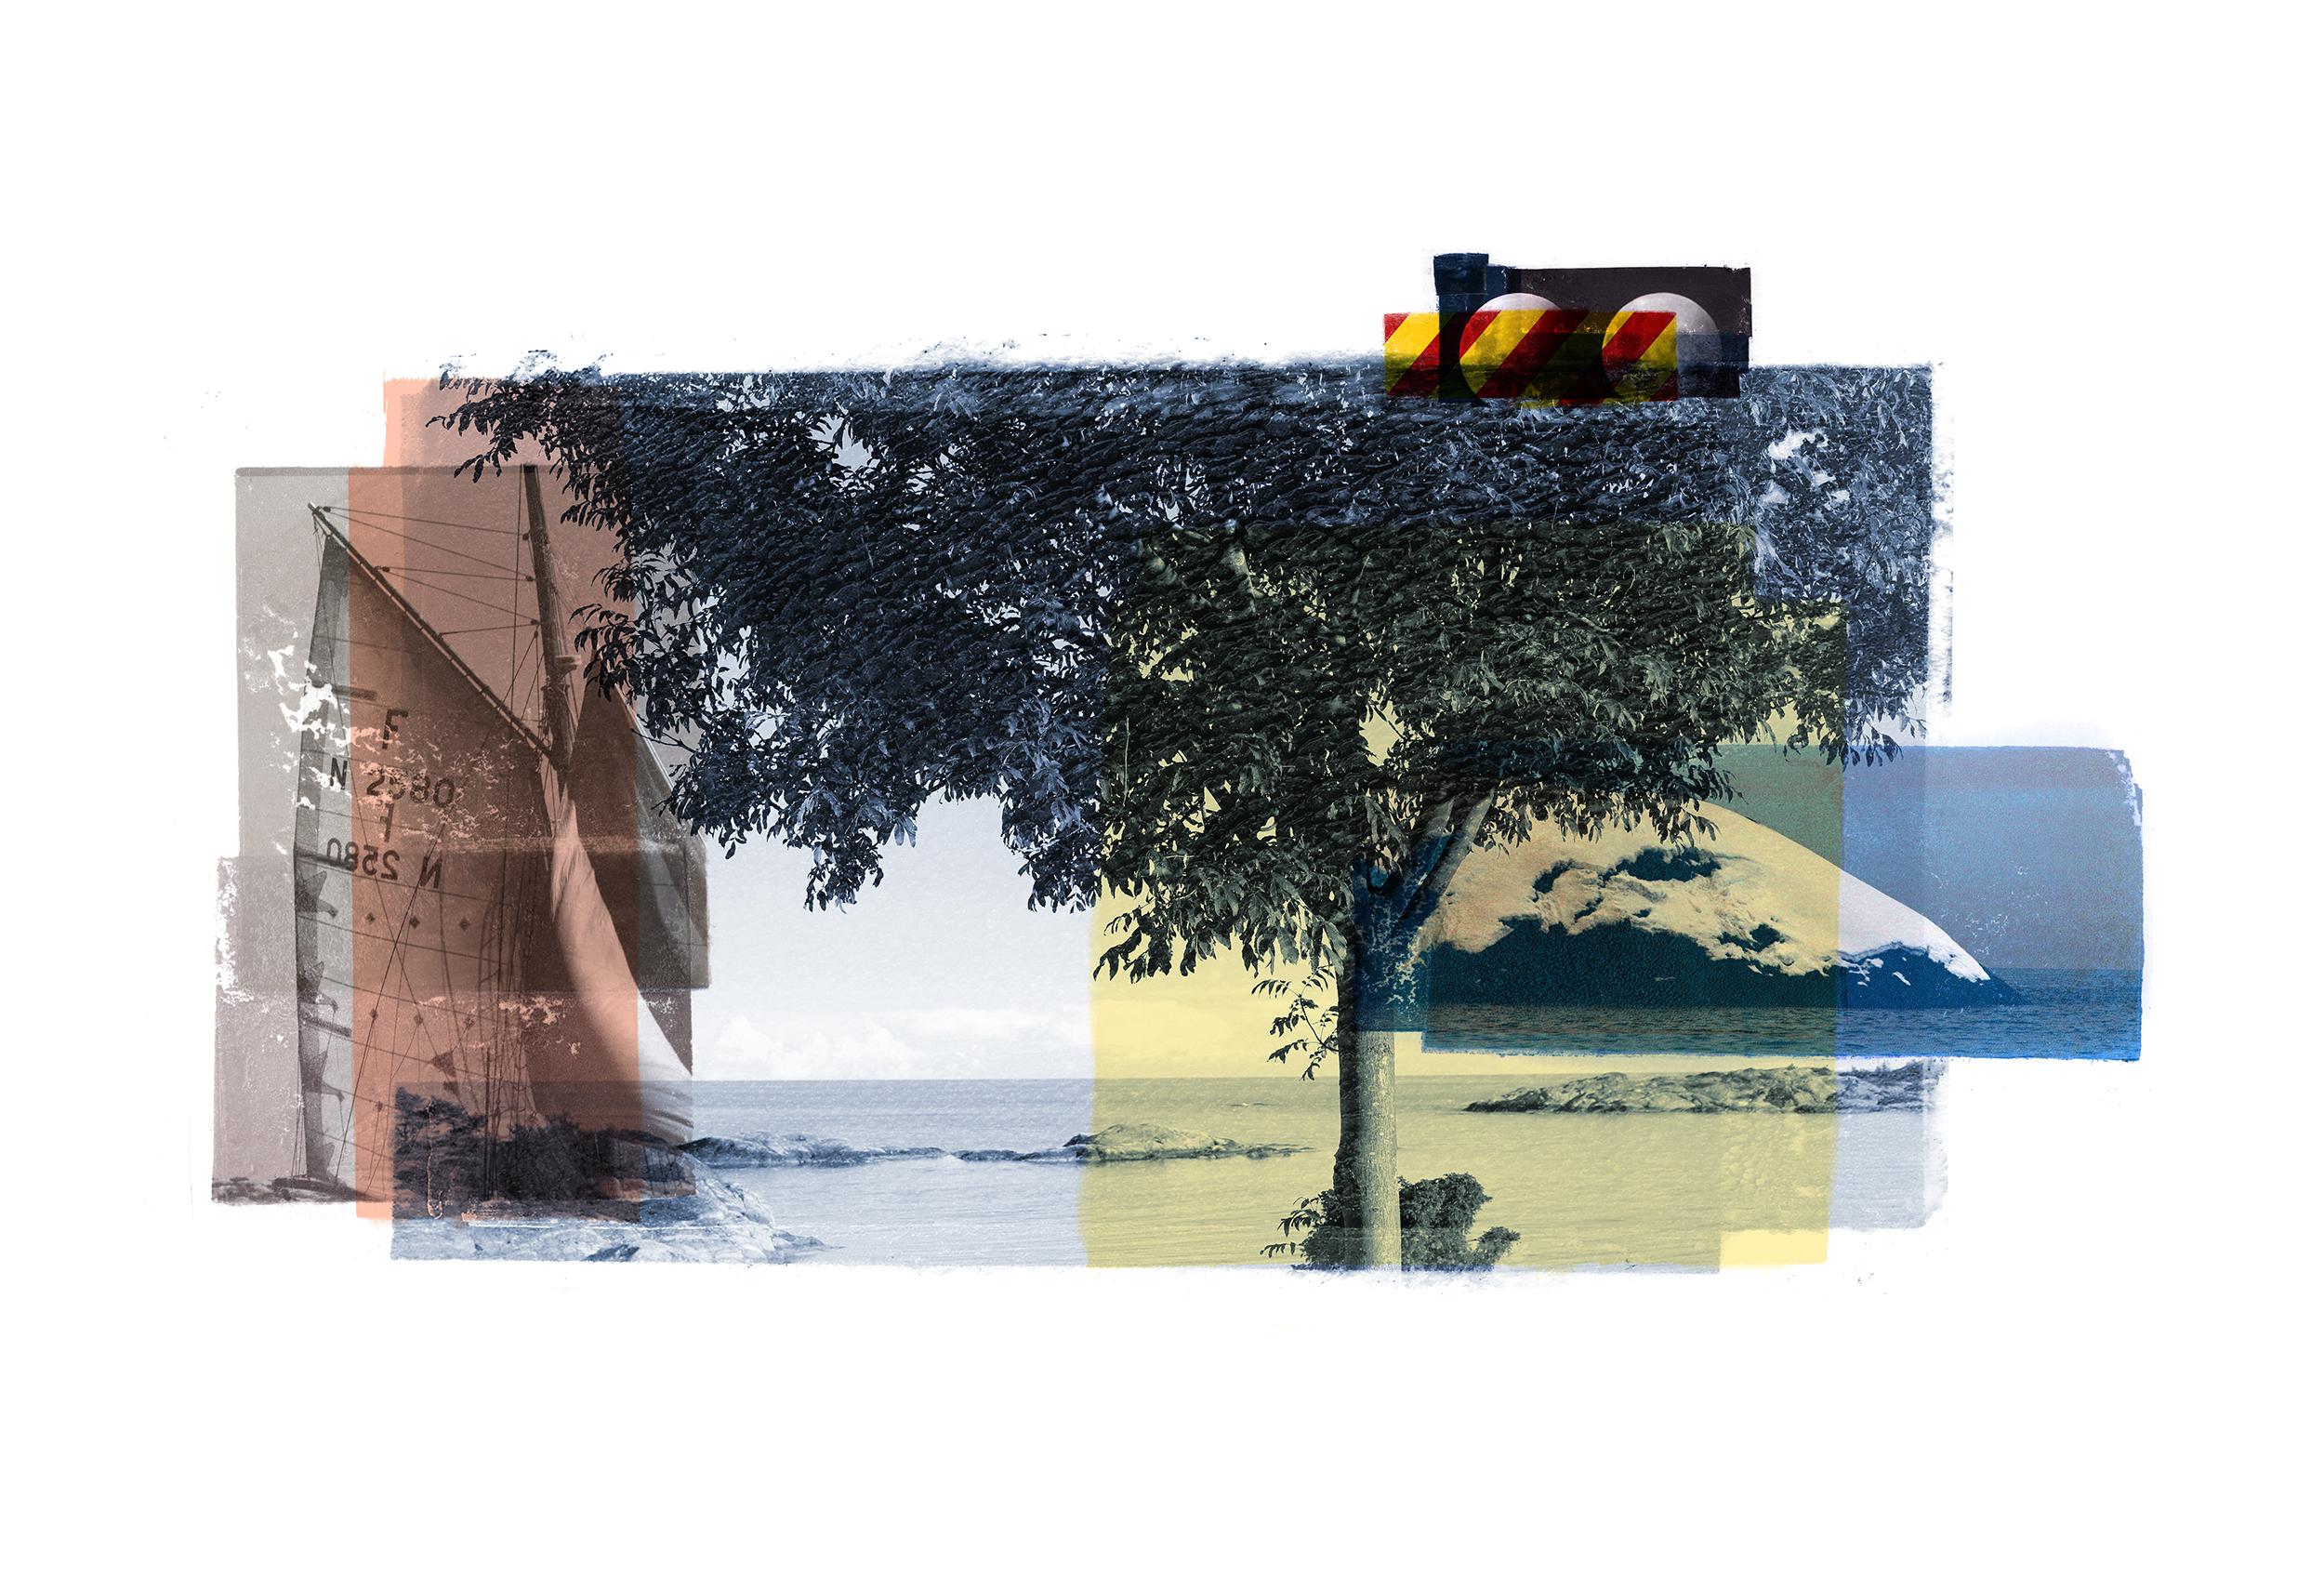 Desaturated Composition / NYH  Original Archival UV Pigment Print / BFK Rives 250 gr 56 x 35 cm / 13,7 x 22 in Edition of 50 + 7 Ap Editeur: Per Fronth Studios / Printer Henrik Aunevik  15/2015: